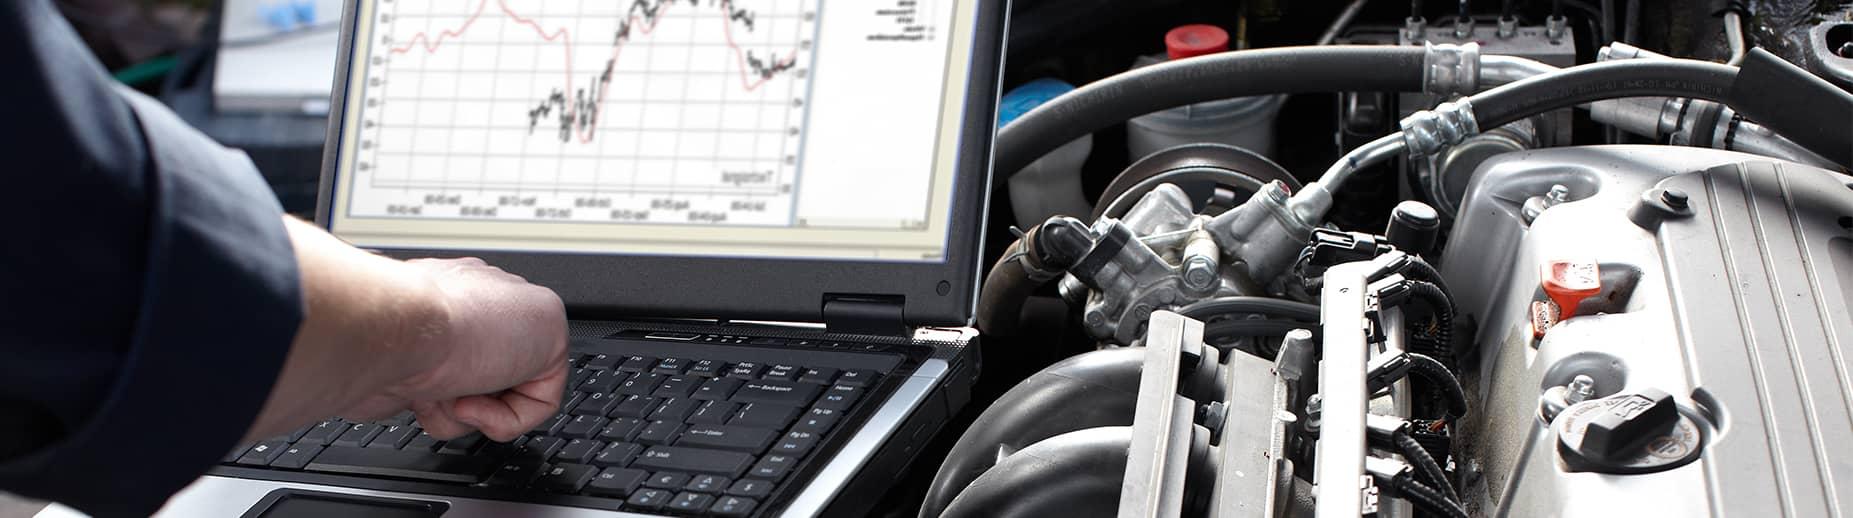 Ridgeway Car Repair, Auto Mechanic and 24 Hour Towing